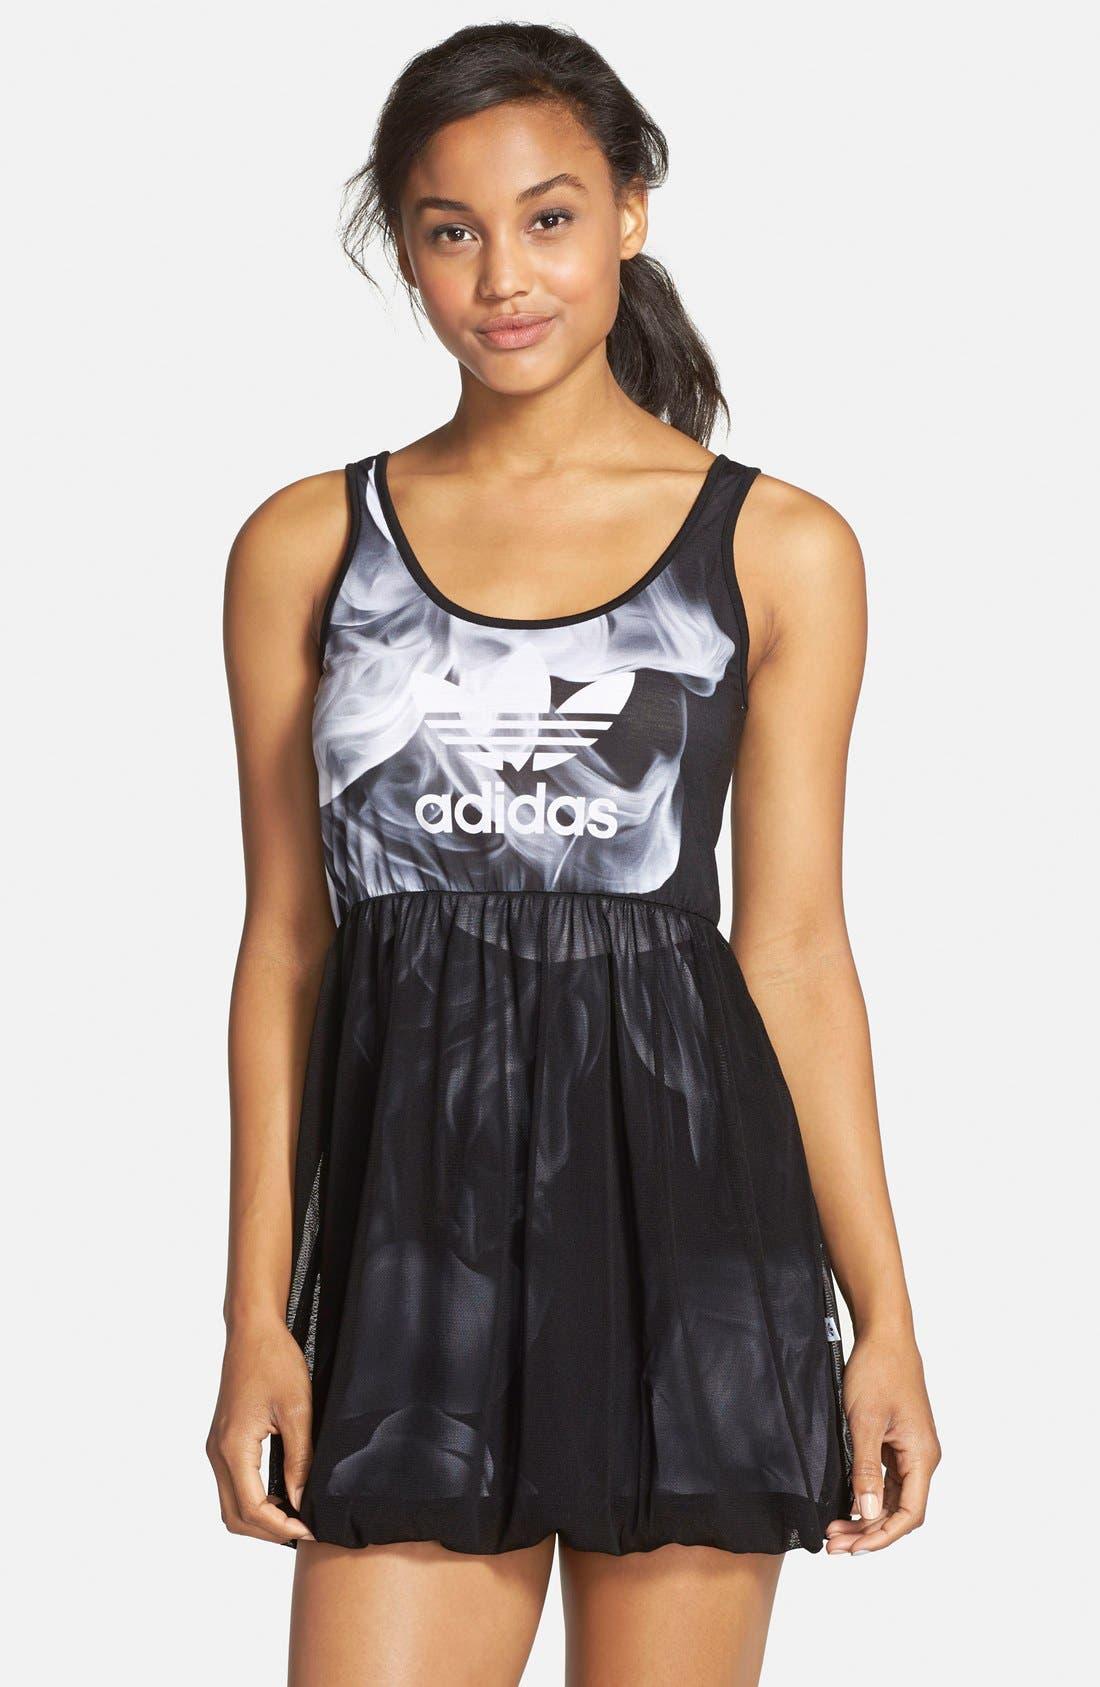 adidas 'White Smoke' Tank Dress,                             Main thumbnail 1, color,                             001